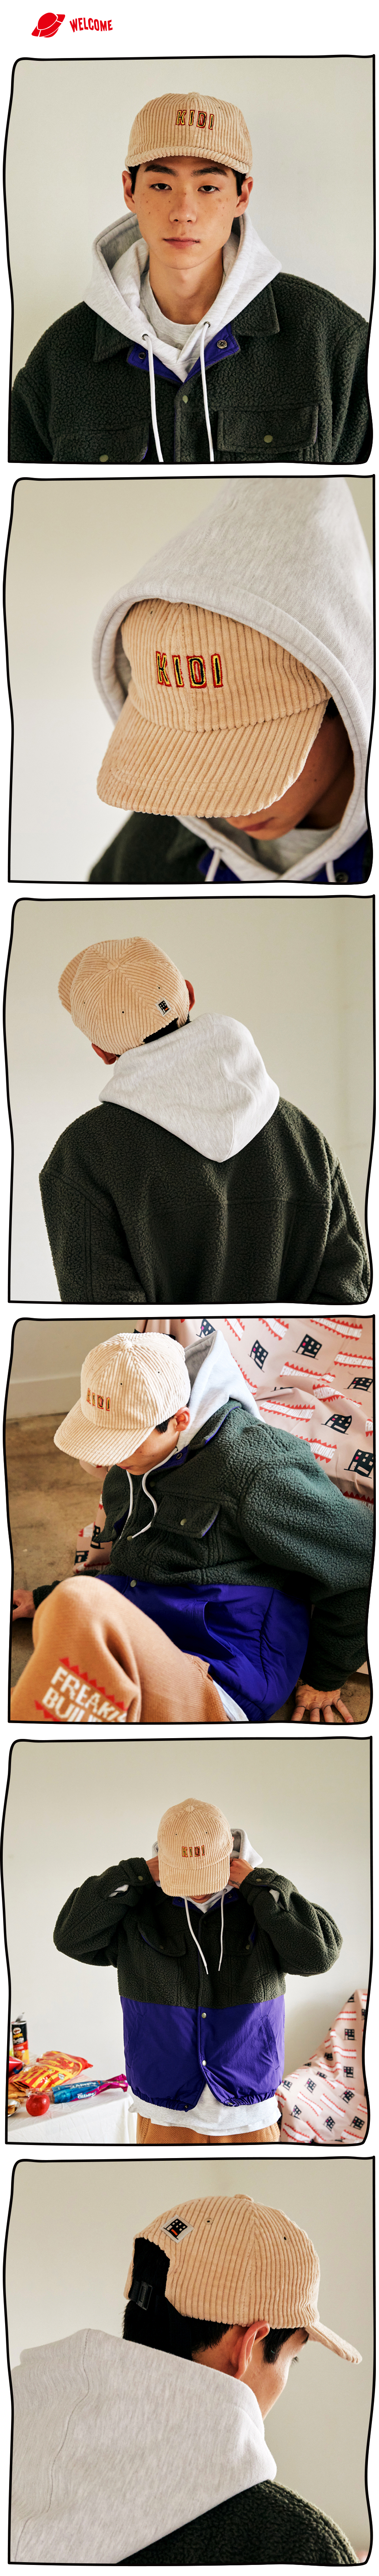 #31 KIDI CORDUROY FLAT CAP (BEIGE) 01.jpg